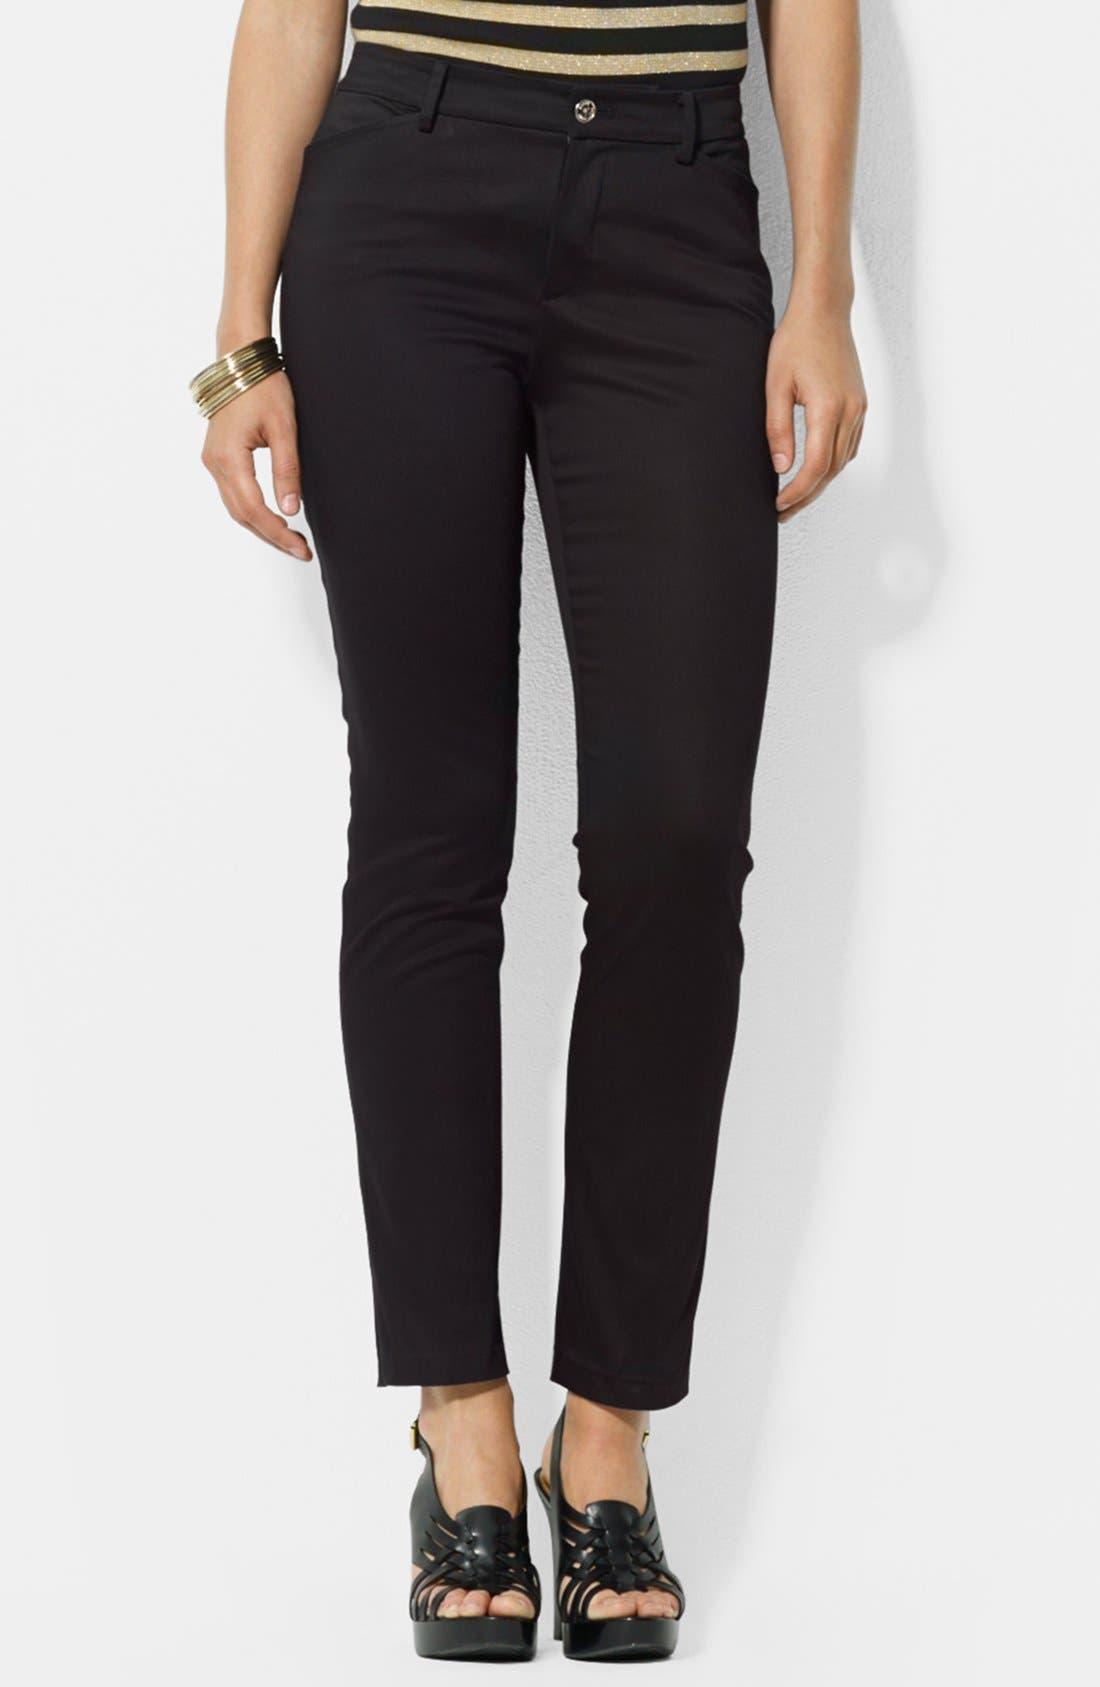 Alternate Image 1 Selected - Lauren Ralph Lauren Stretch Sateen Ankle Pants (Petite)